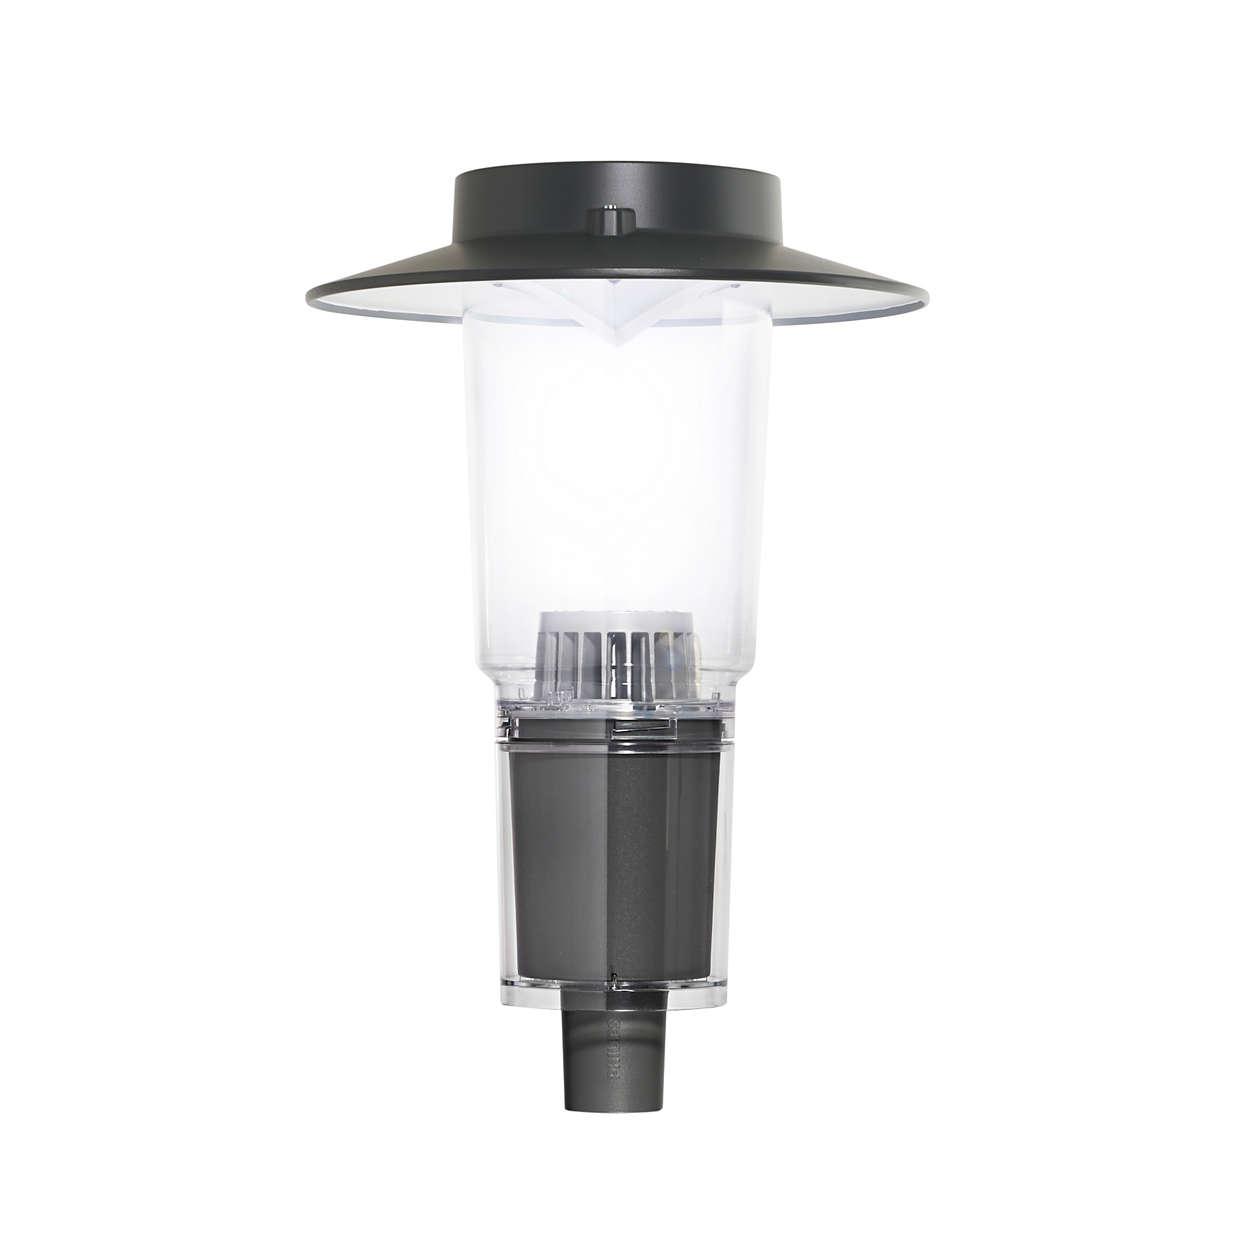 CitySpirit gen2 Wall-mounted LED